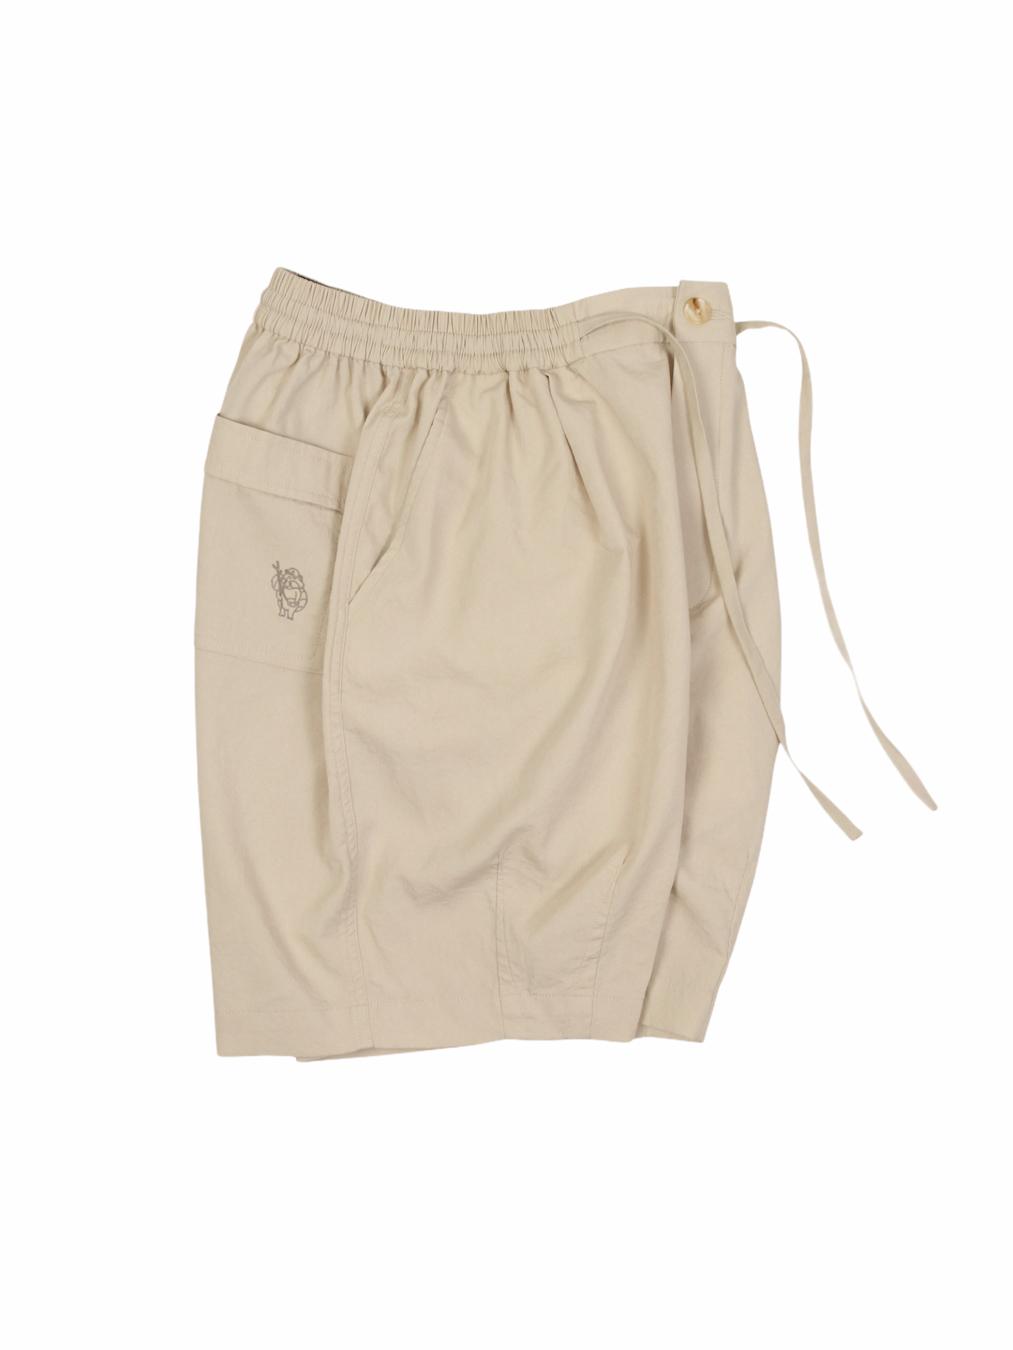 Rayon Balloon Shorts (Beige)